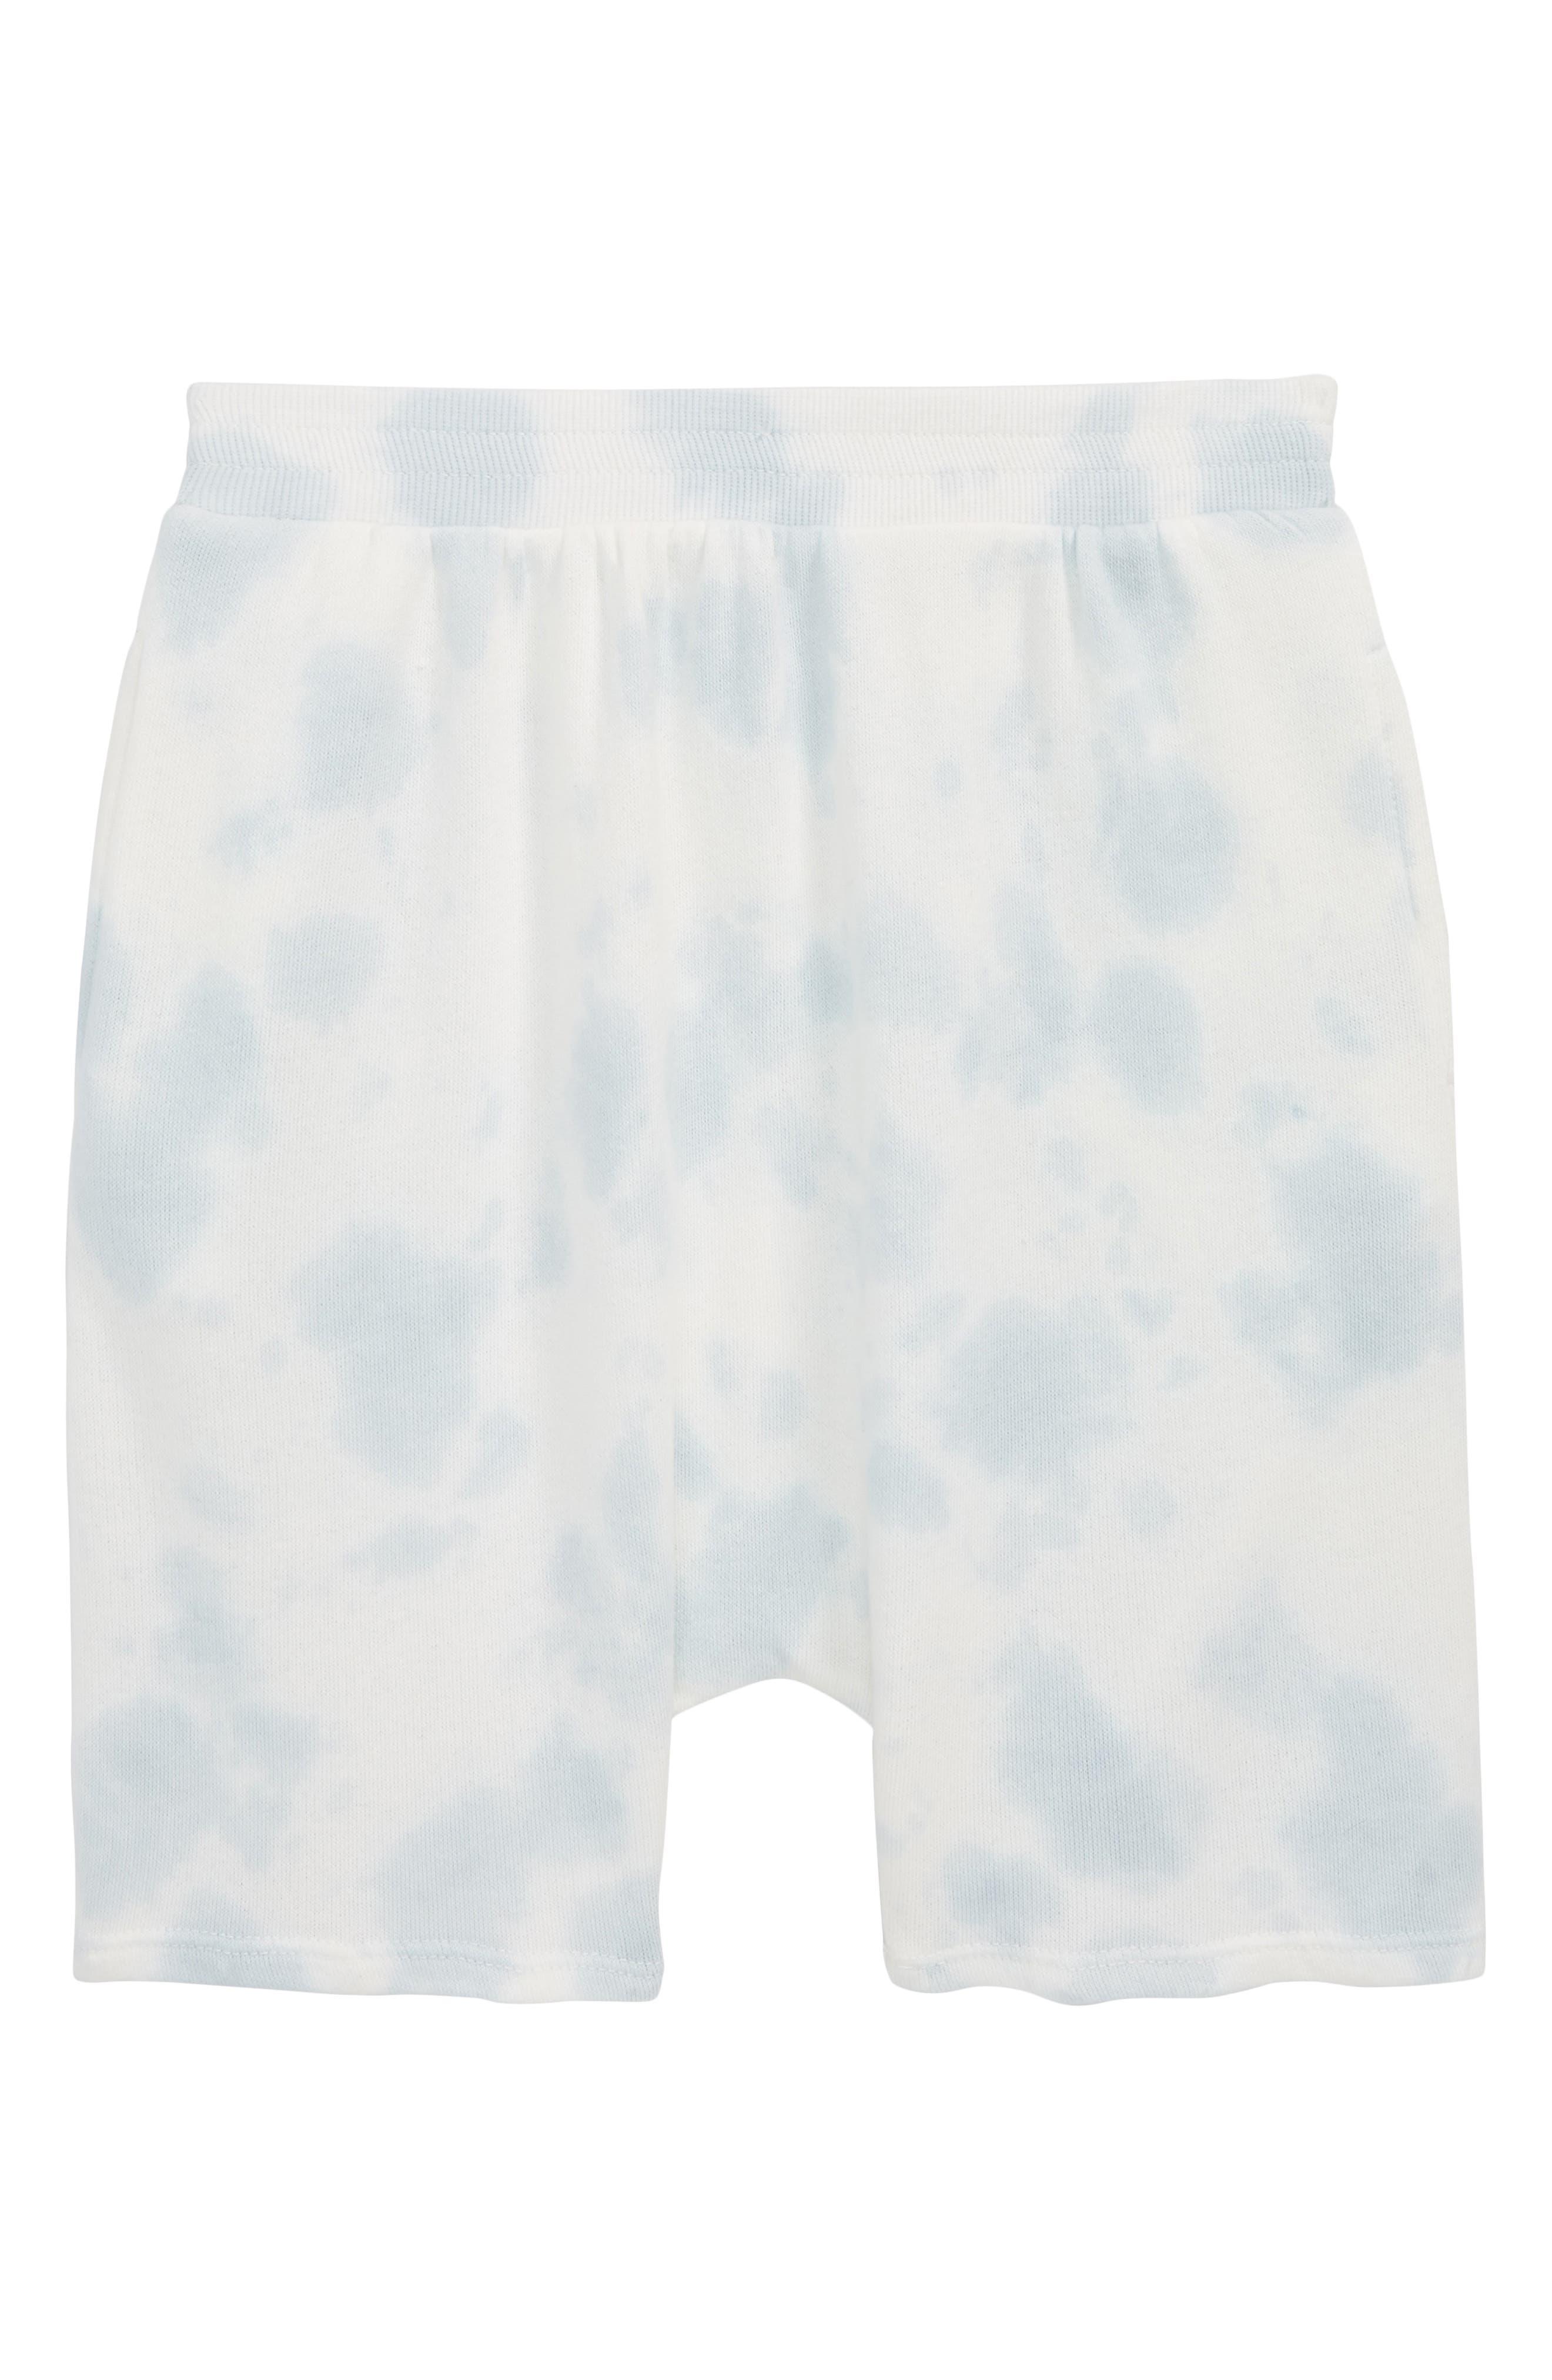 Main Image - Stem Tie Dye Shorts (Toddler Boys, Little Boys & Big Boys)